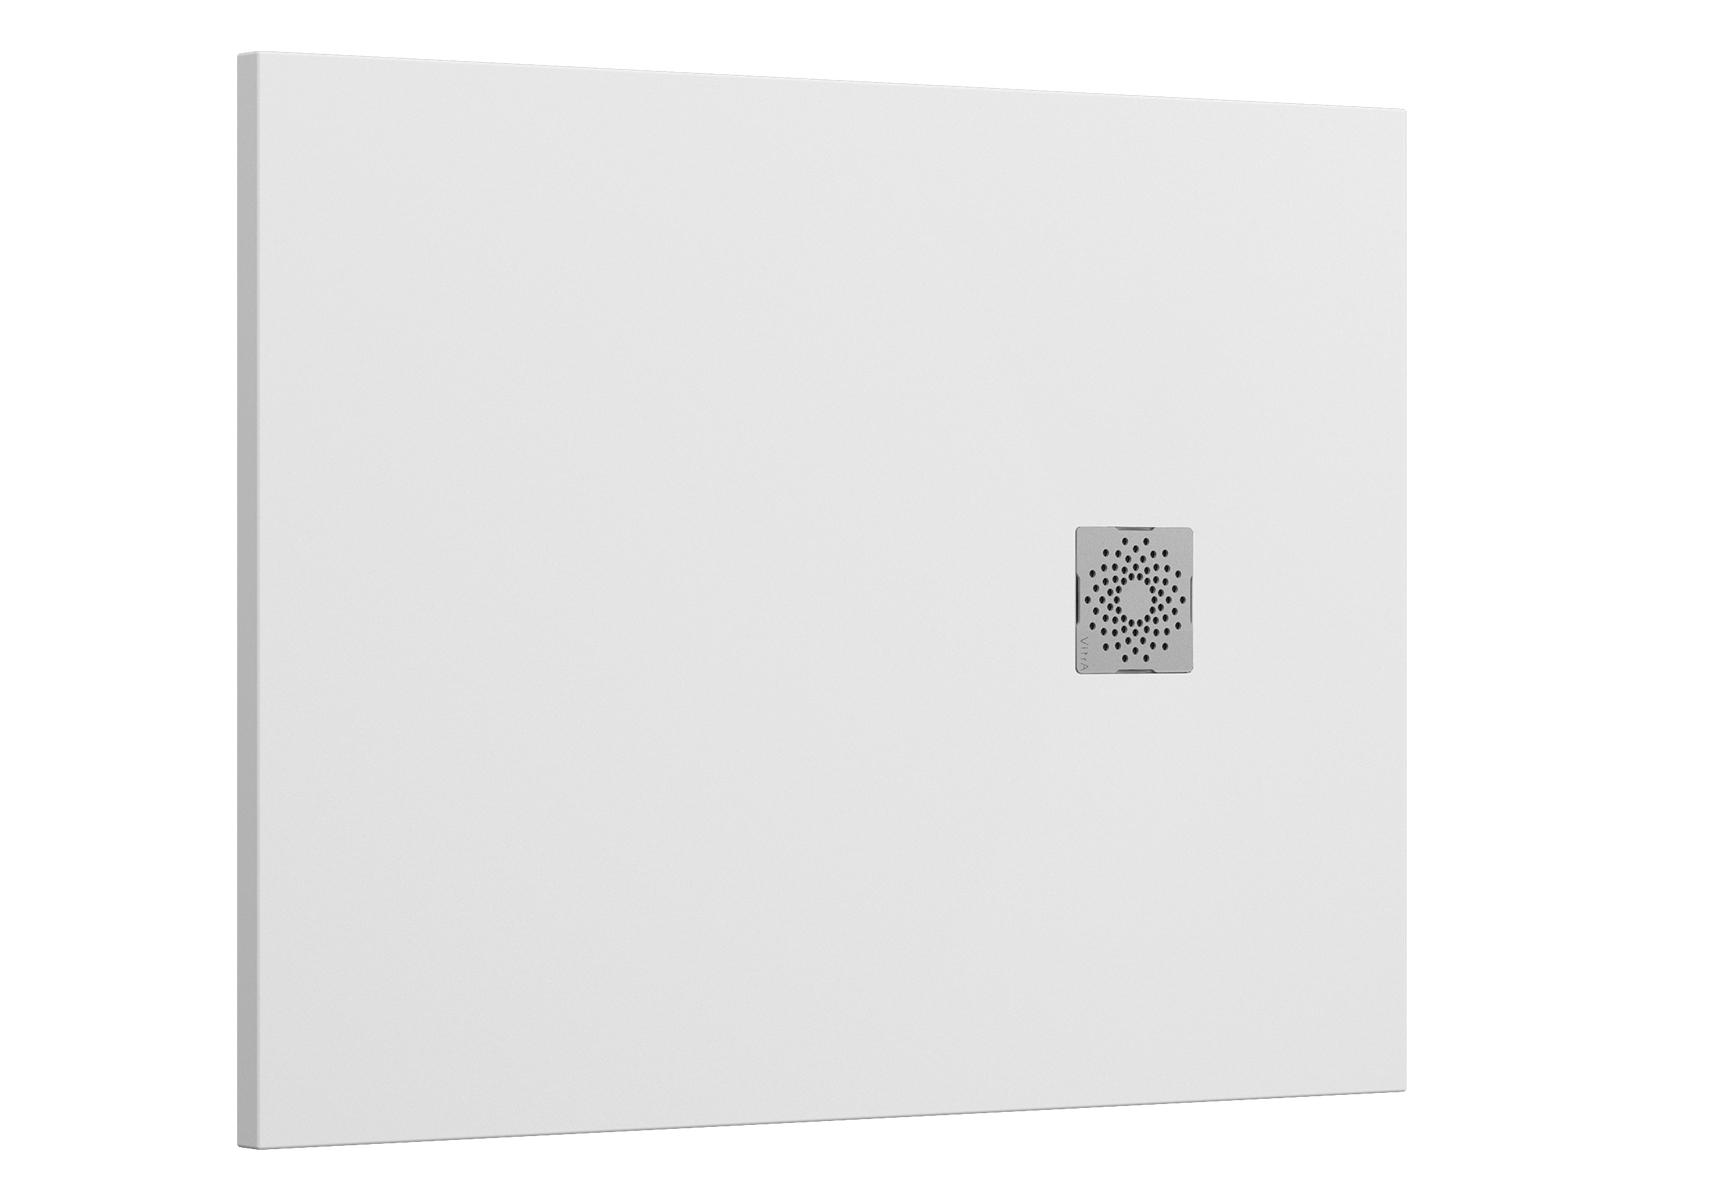 V-Stone Duschwanne, 120 x 90 cm, Weiß